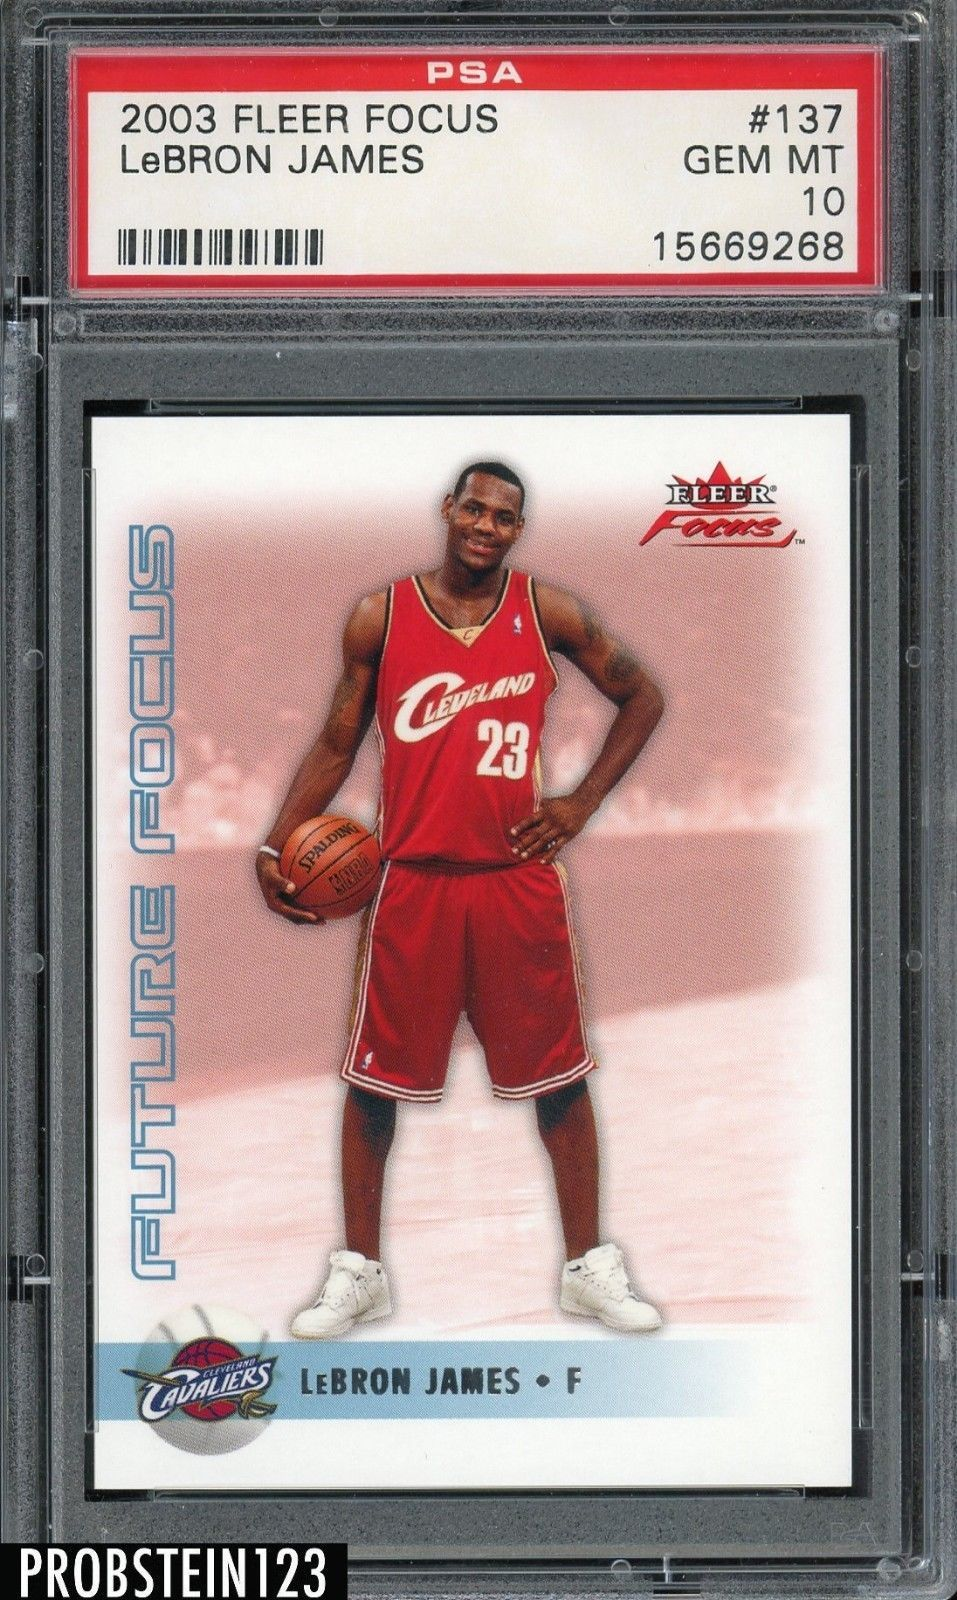 200304 fleer focus 137 lebron james cavaliers rc rookie